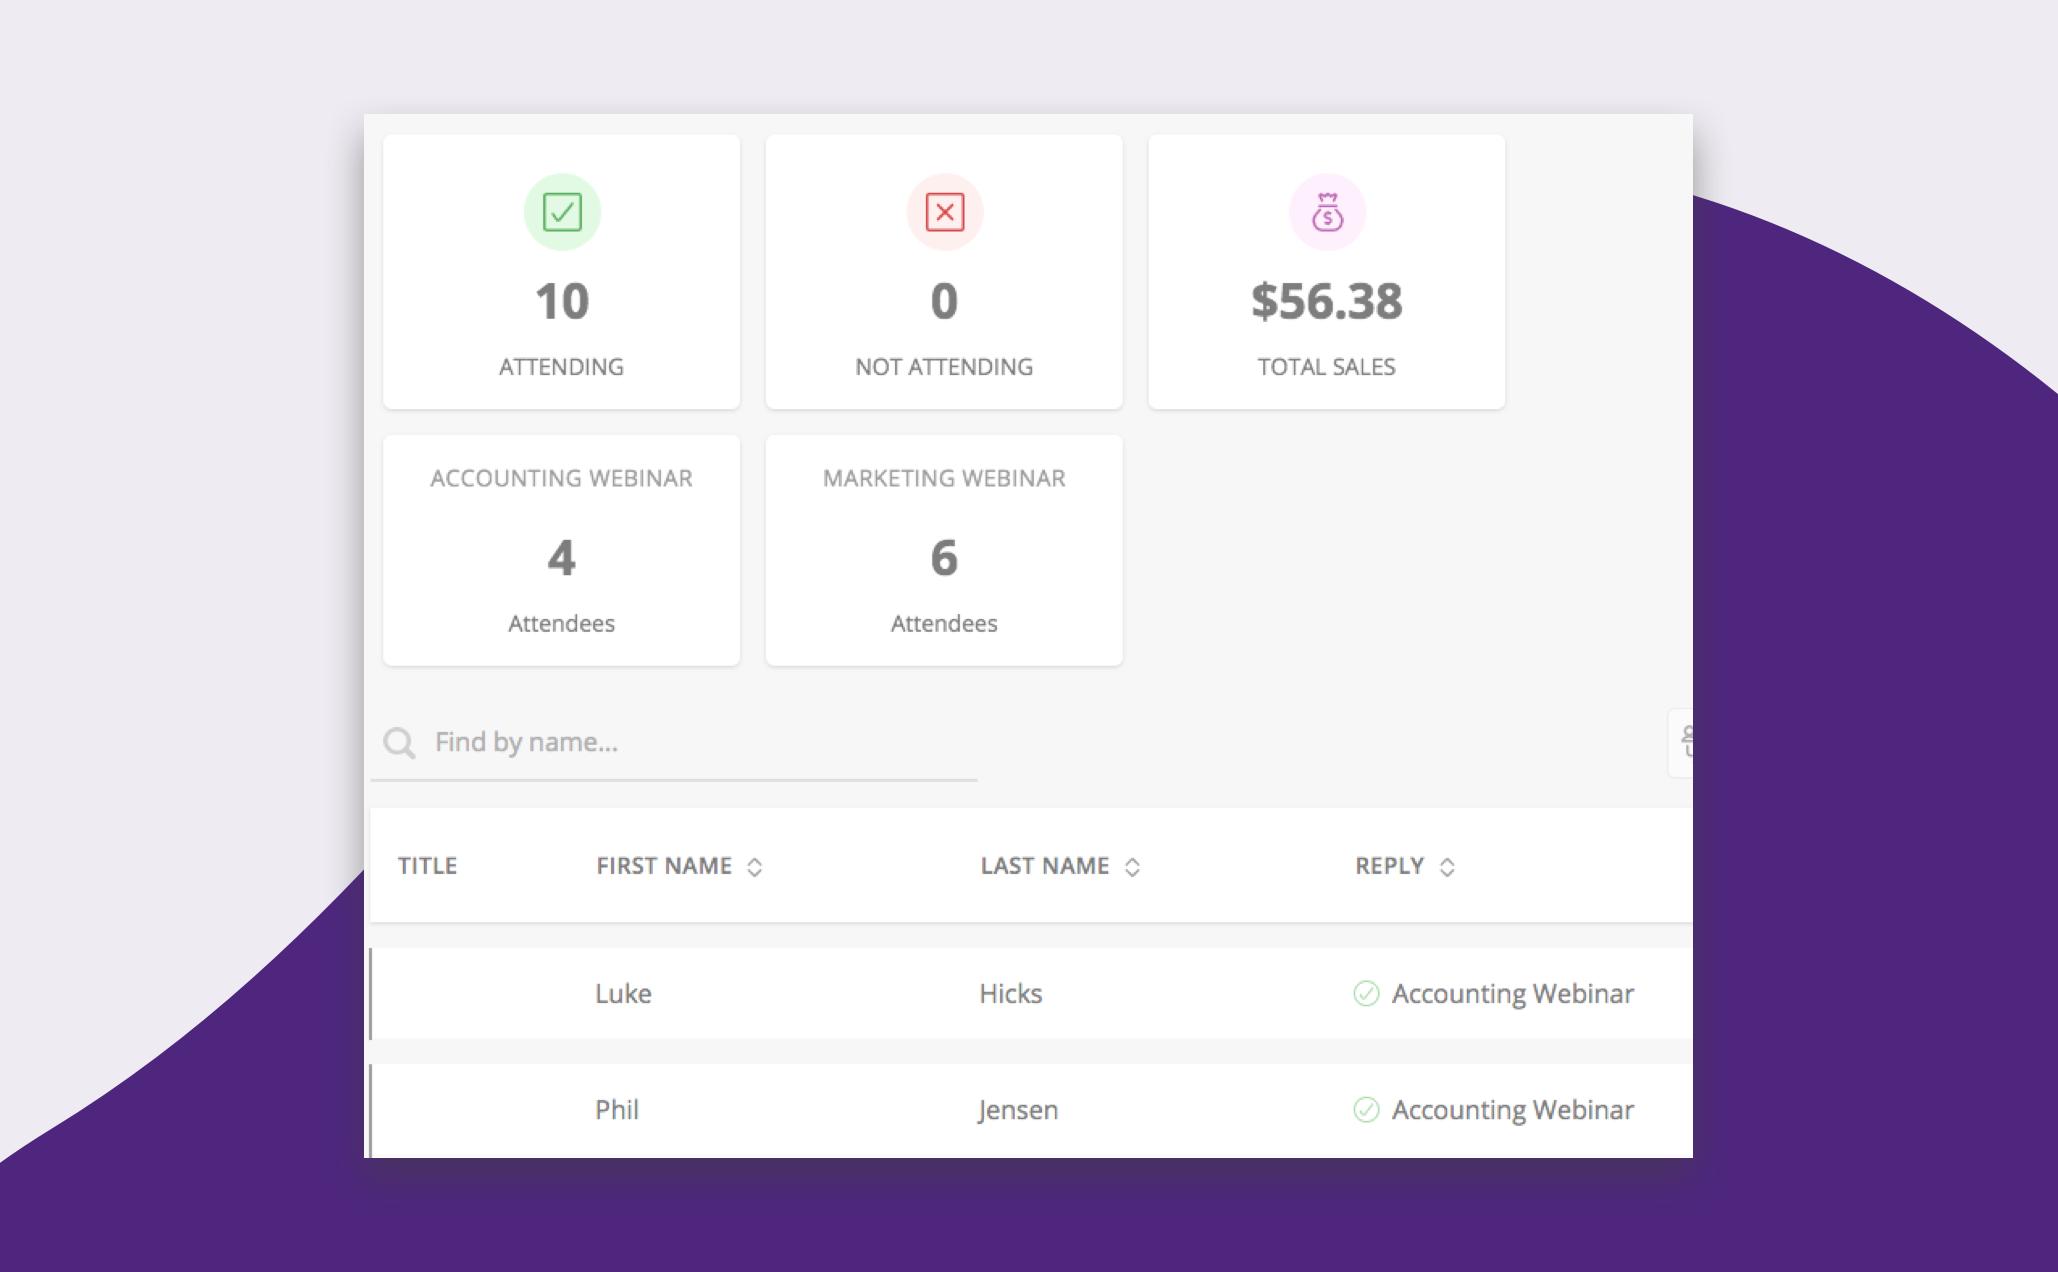 Event Management Platform Ticket Sales Dashboard for Zoom Meeting Ticket Sales